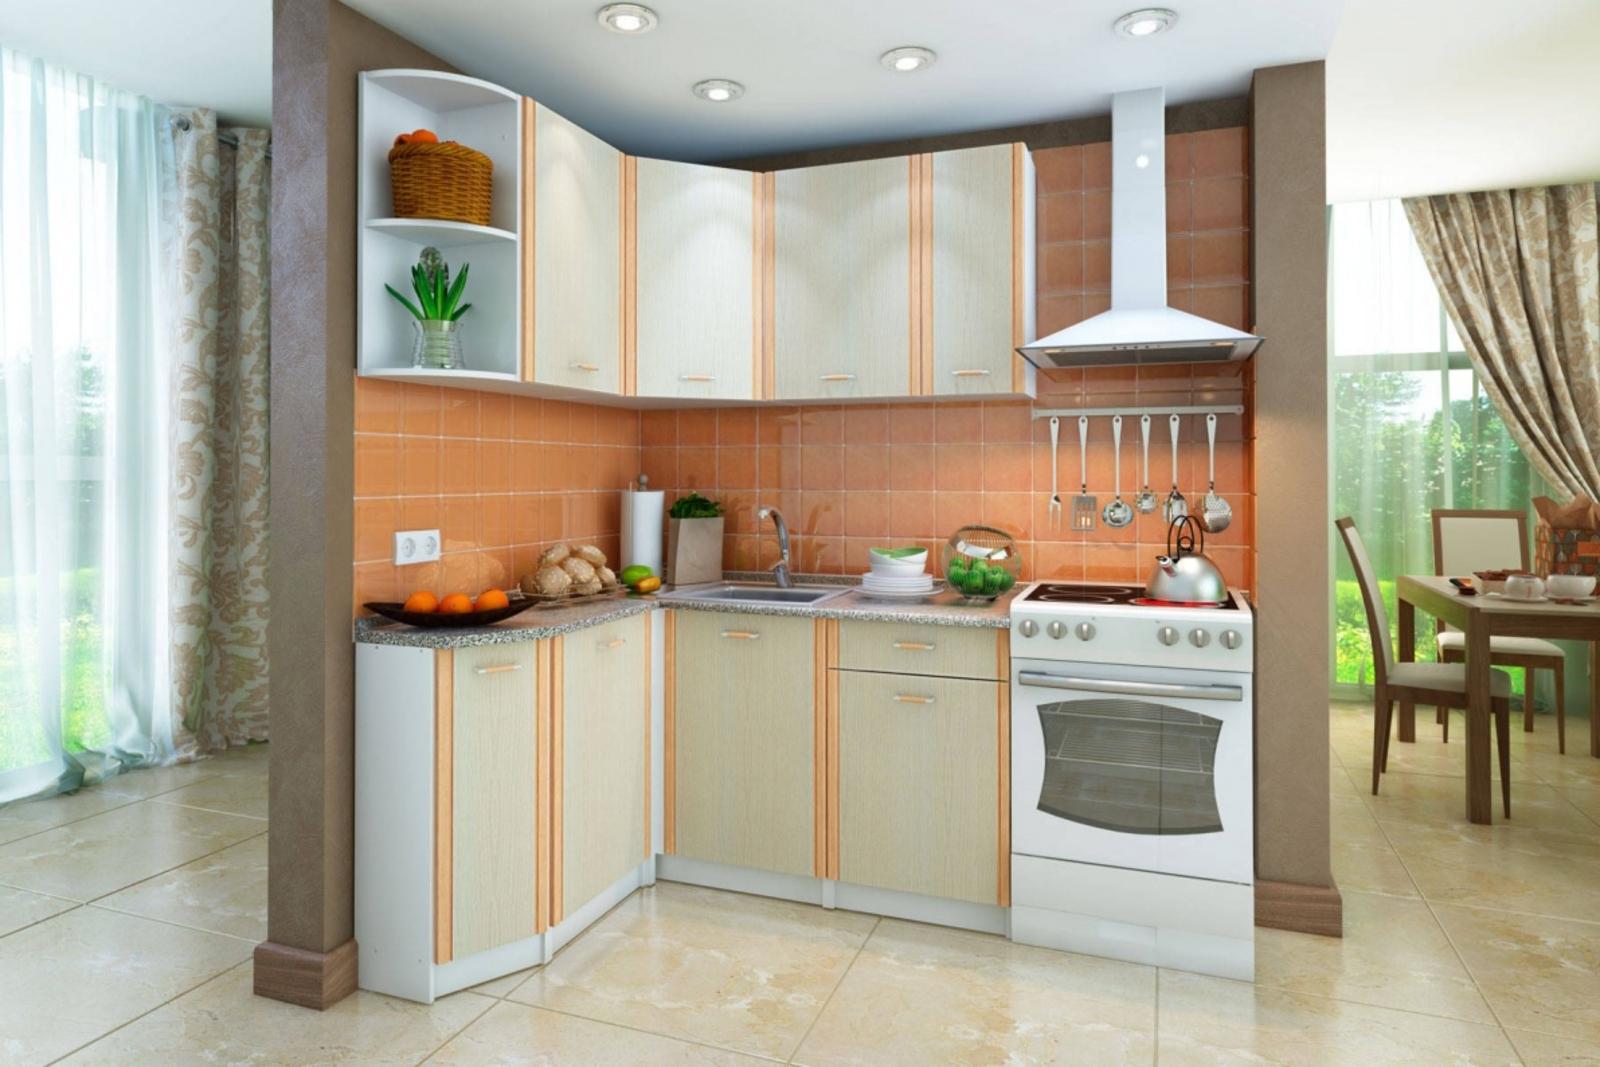 Кухонный гарнитур Лагуна левый угол (белый/дуб кремона) Лагуна